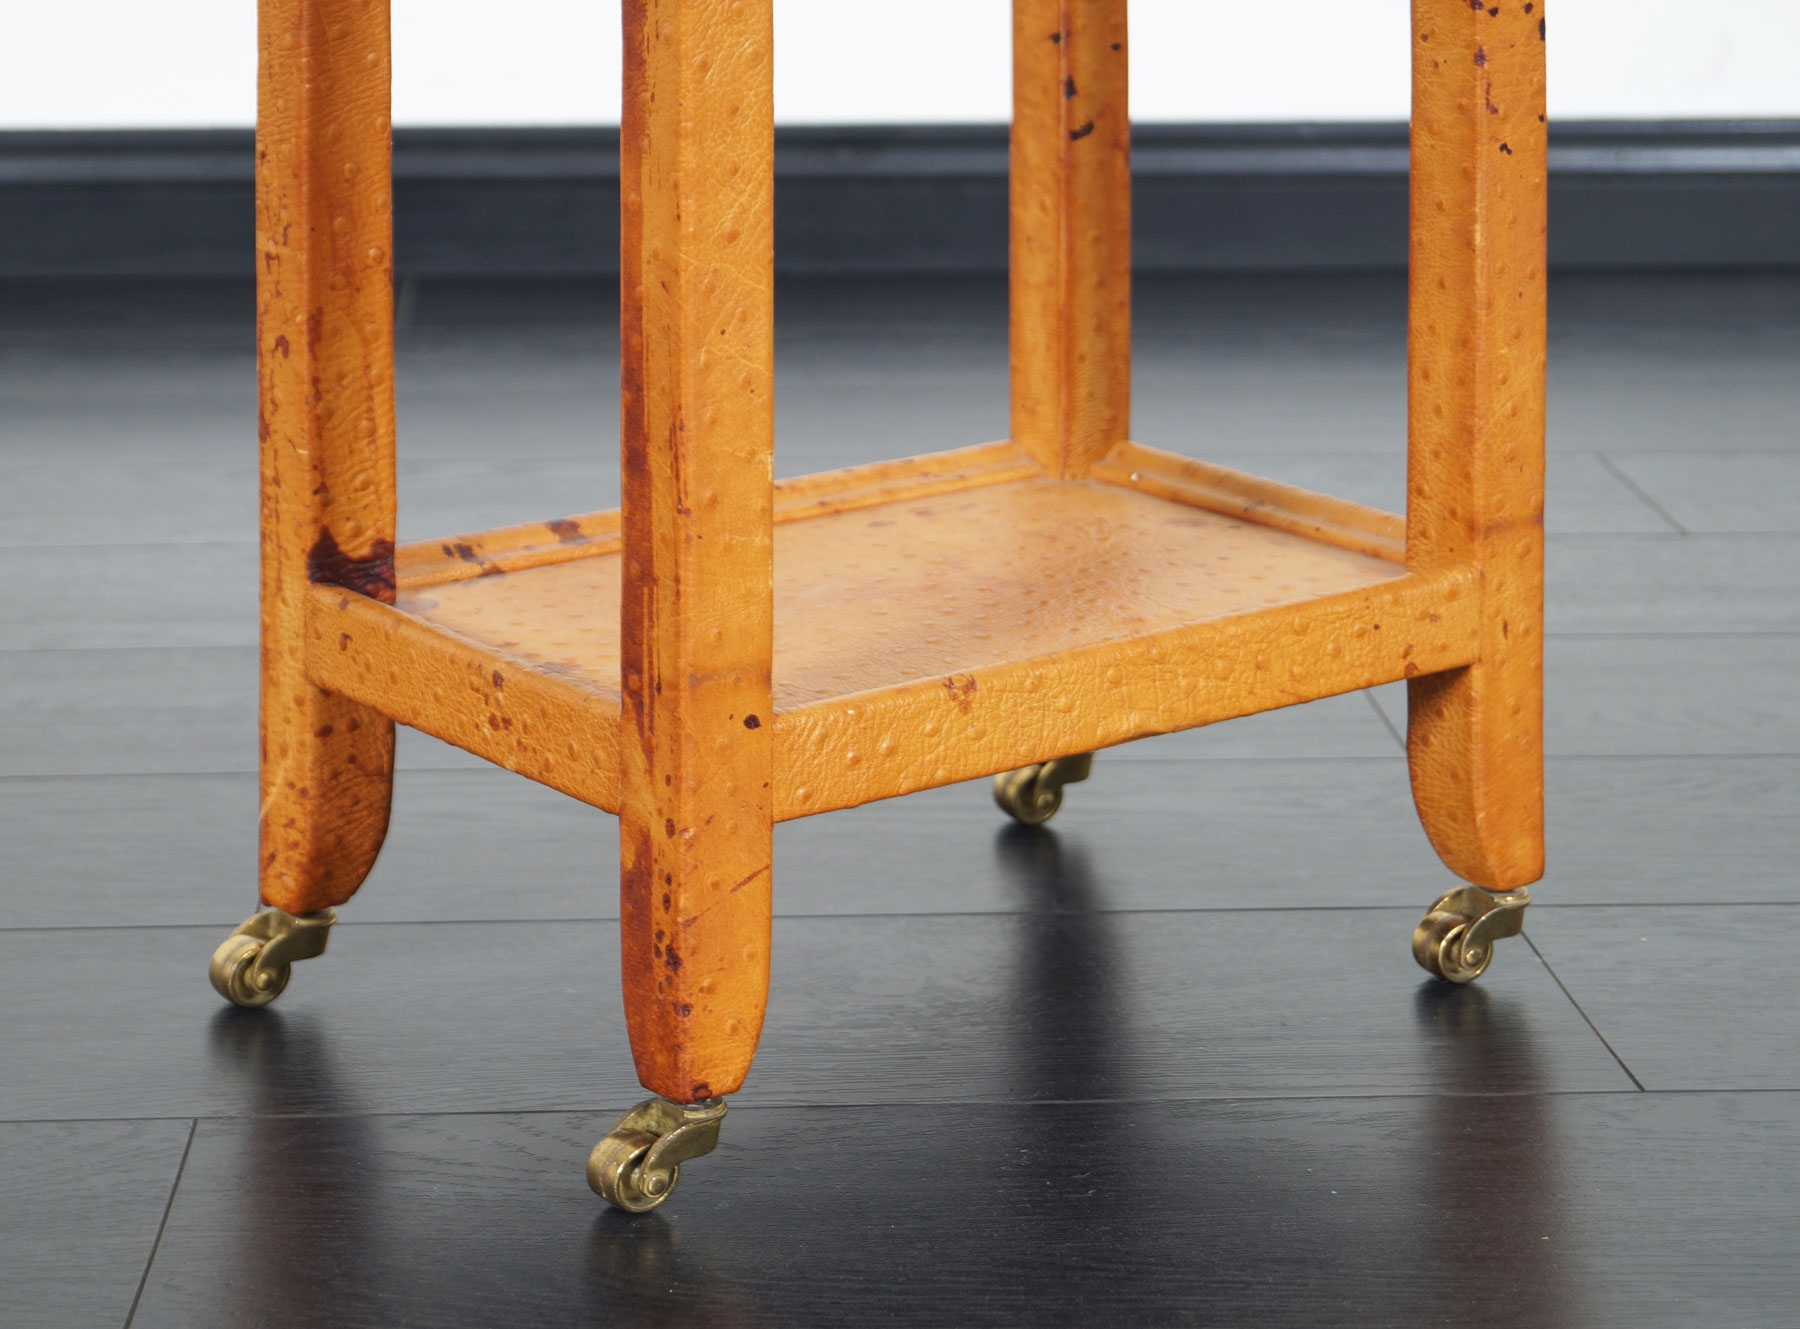 Vintage Ostrich Leather Table by Karl Springer